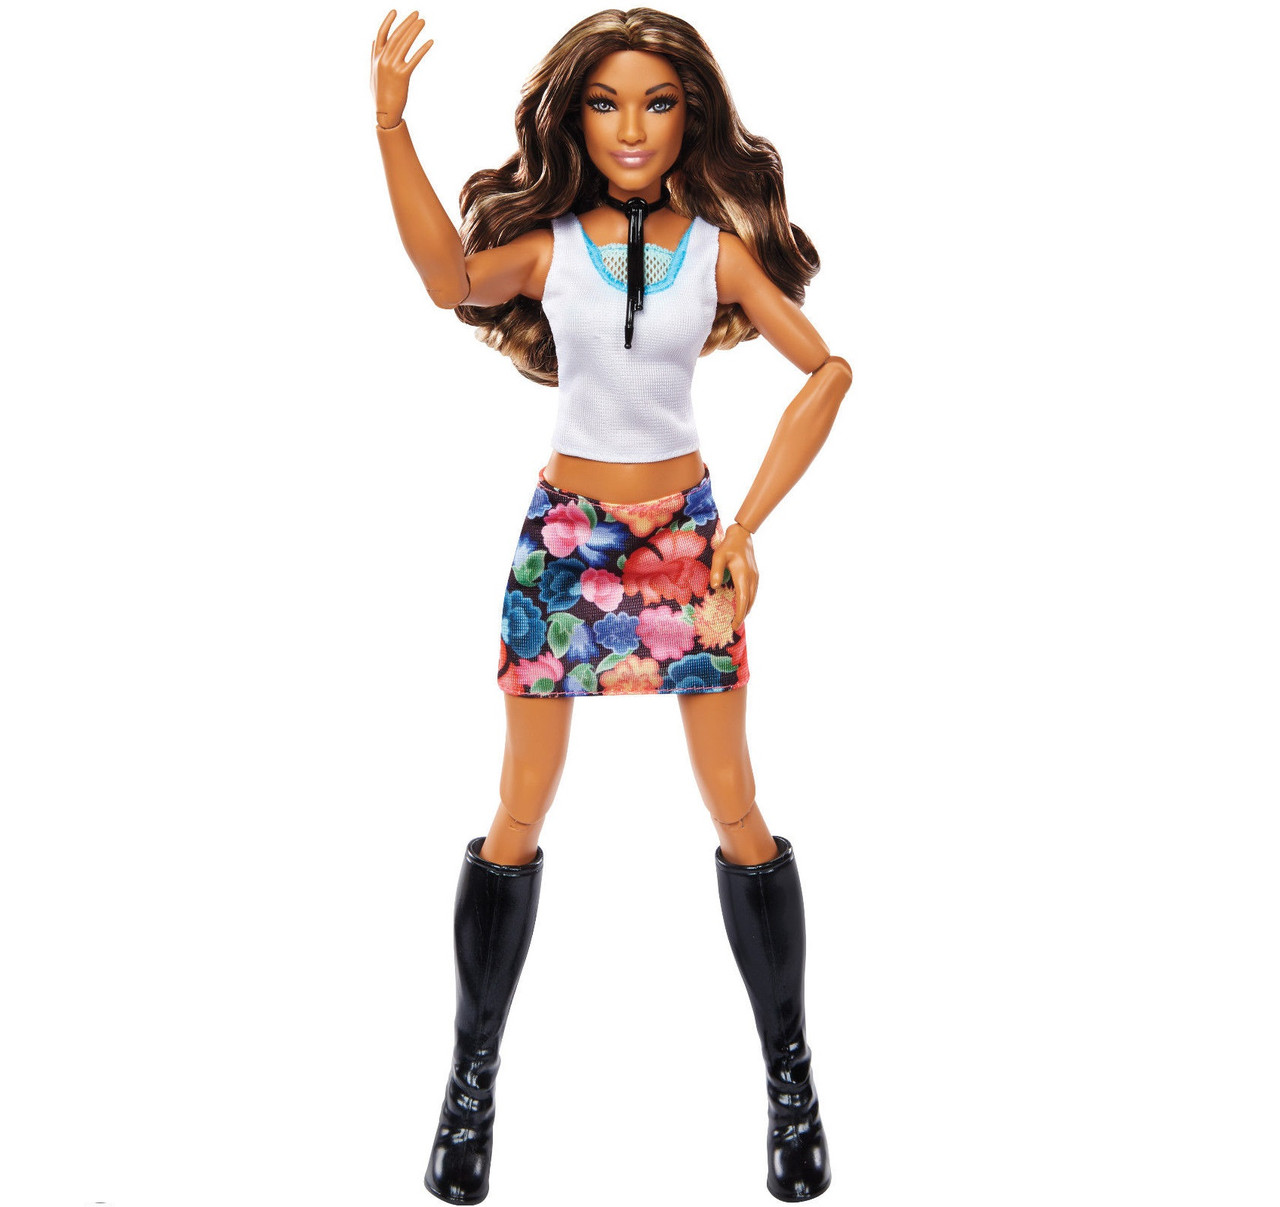 Кукла Суперзвезда Алисия Фокс, WWE Superstars Alicia Fox Fashion Doll